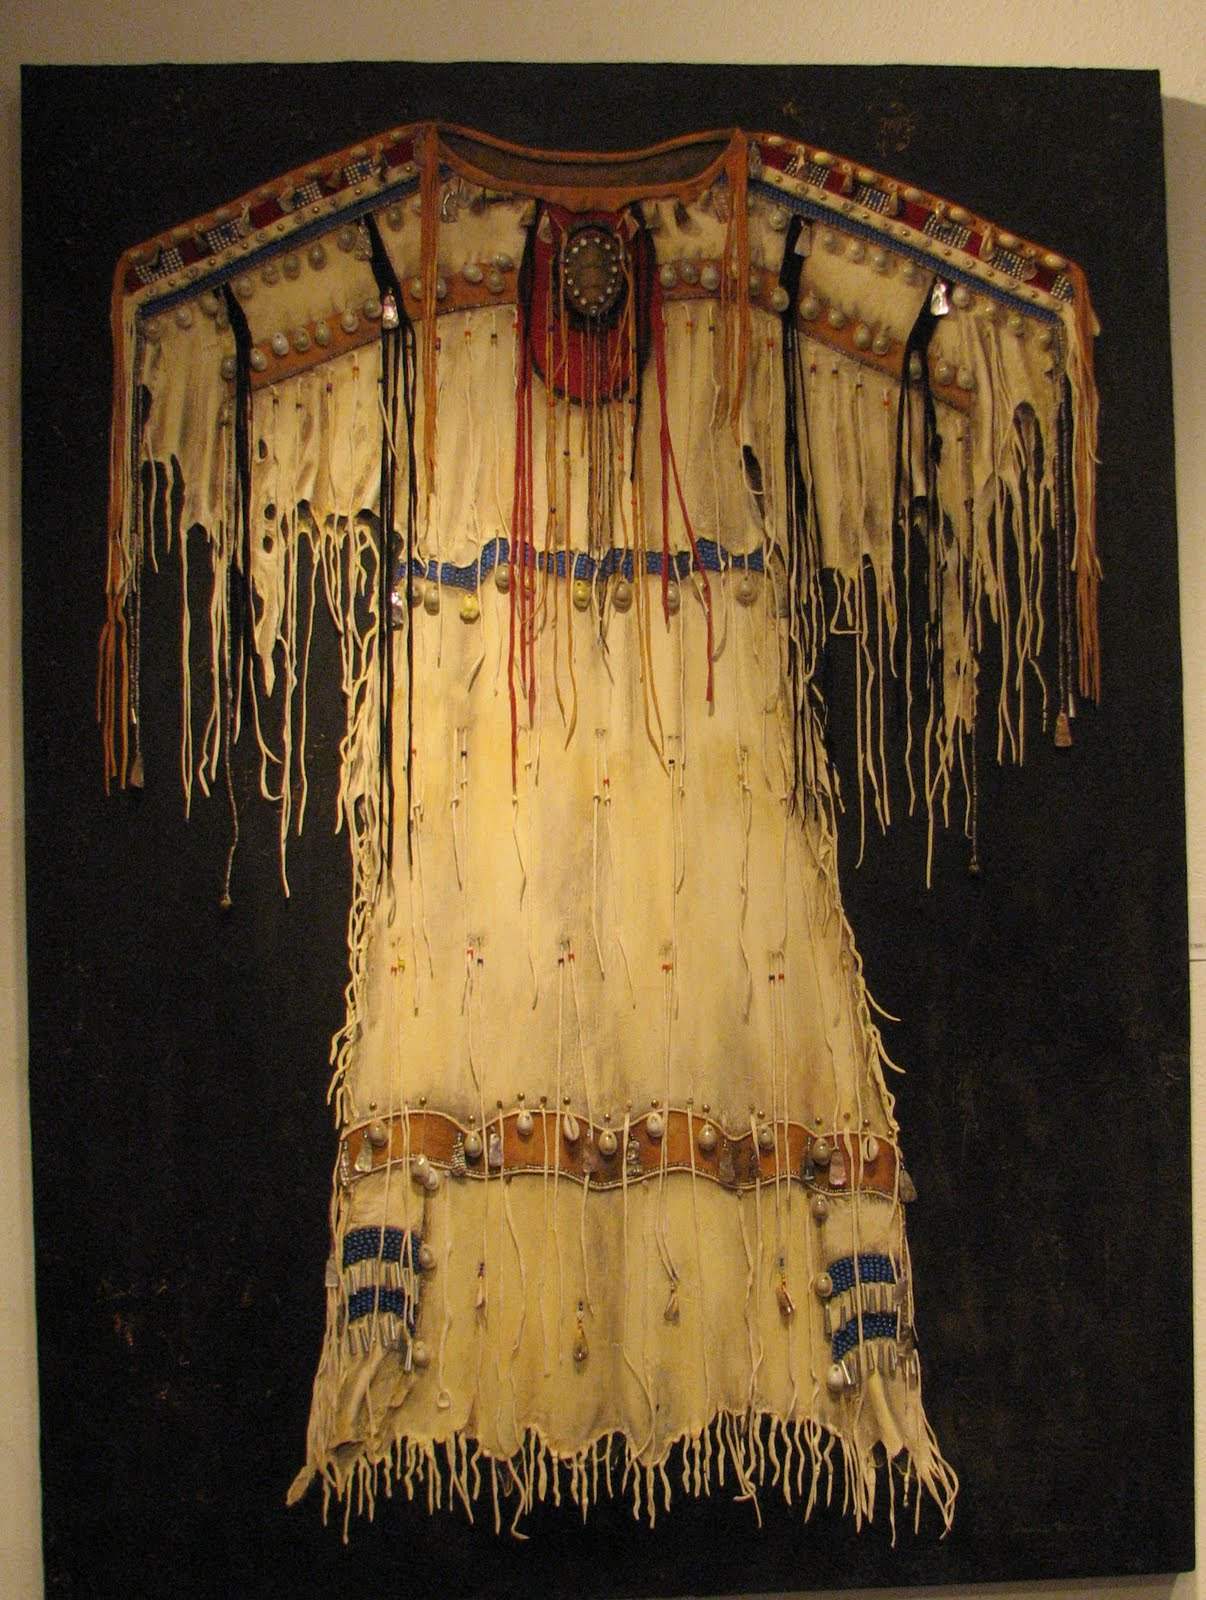 authentic native american indian clothing dsxsiDa 7CeU 7CXLZEVTEcakpzI*Q native american wedding dress Native American Dress Wedding